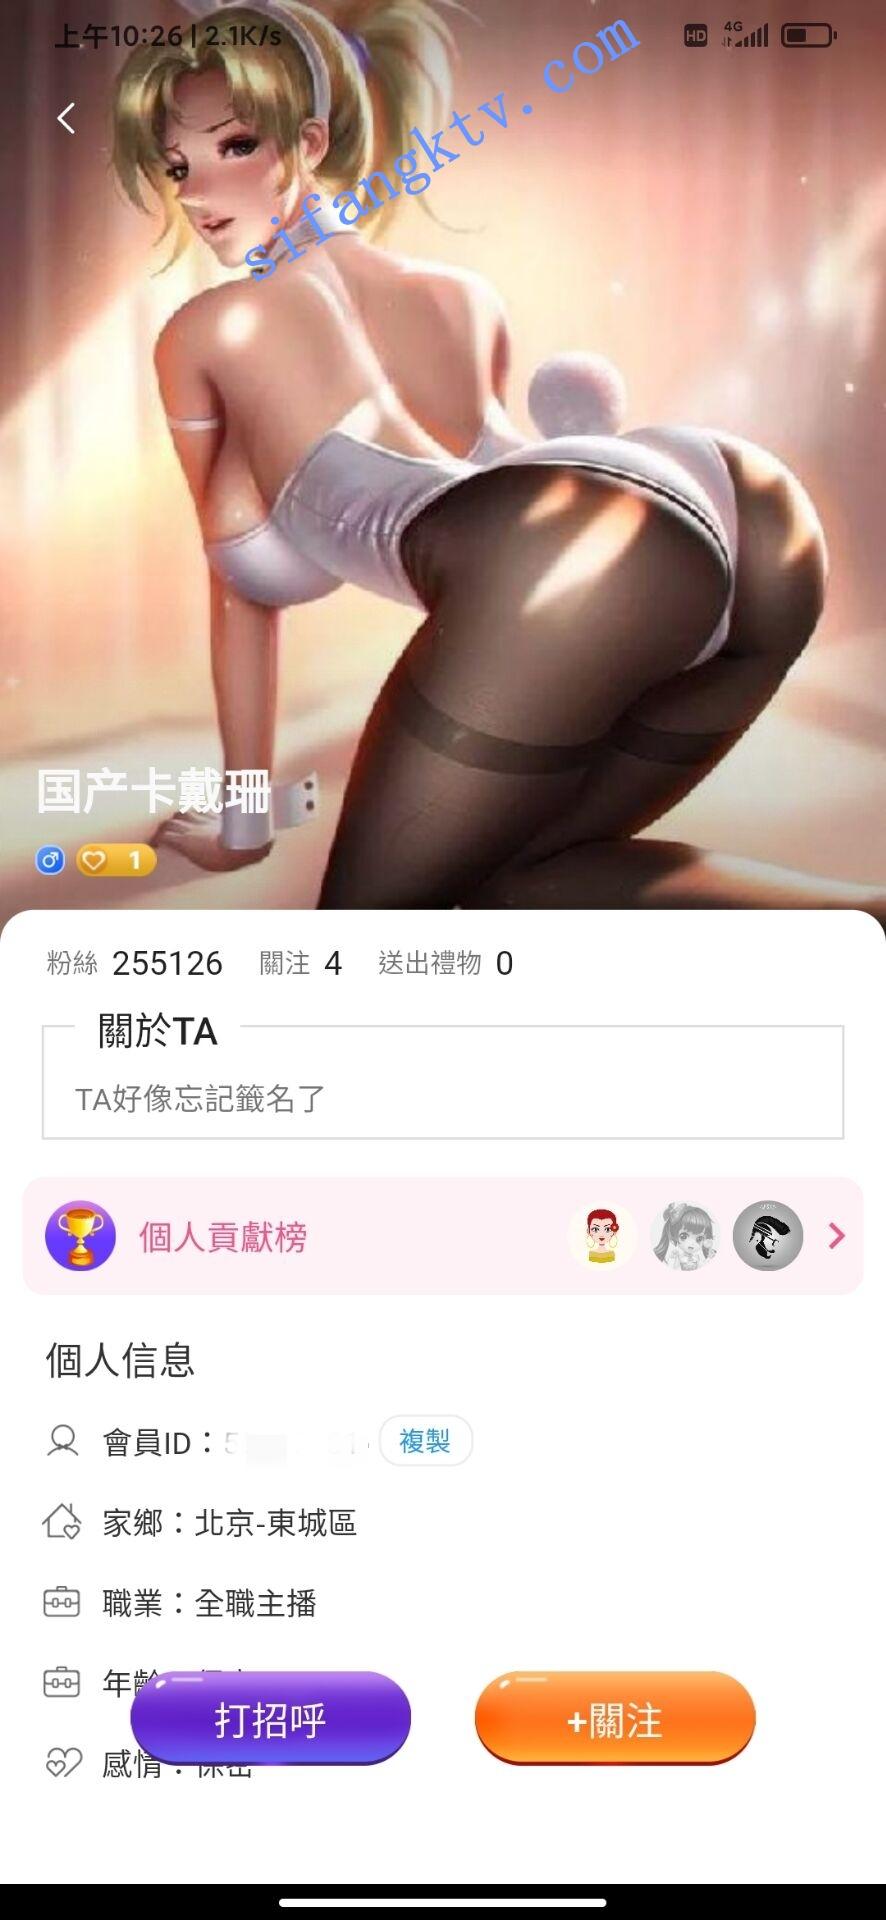 【25w粉丝】美乳高颜卡戴珊勾引外卖哥几百元福利23部